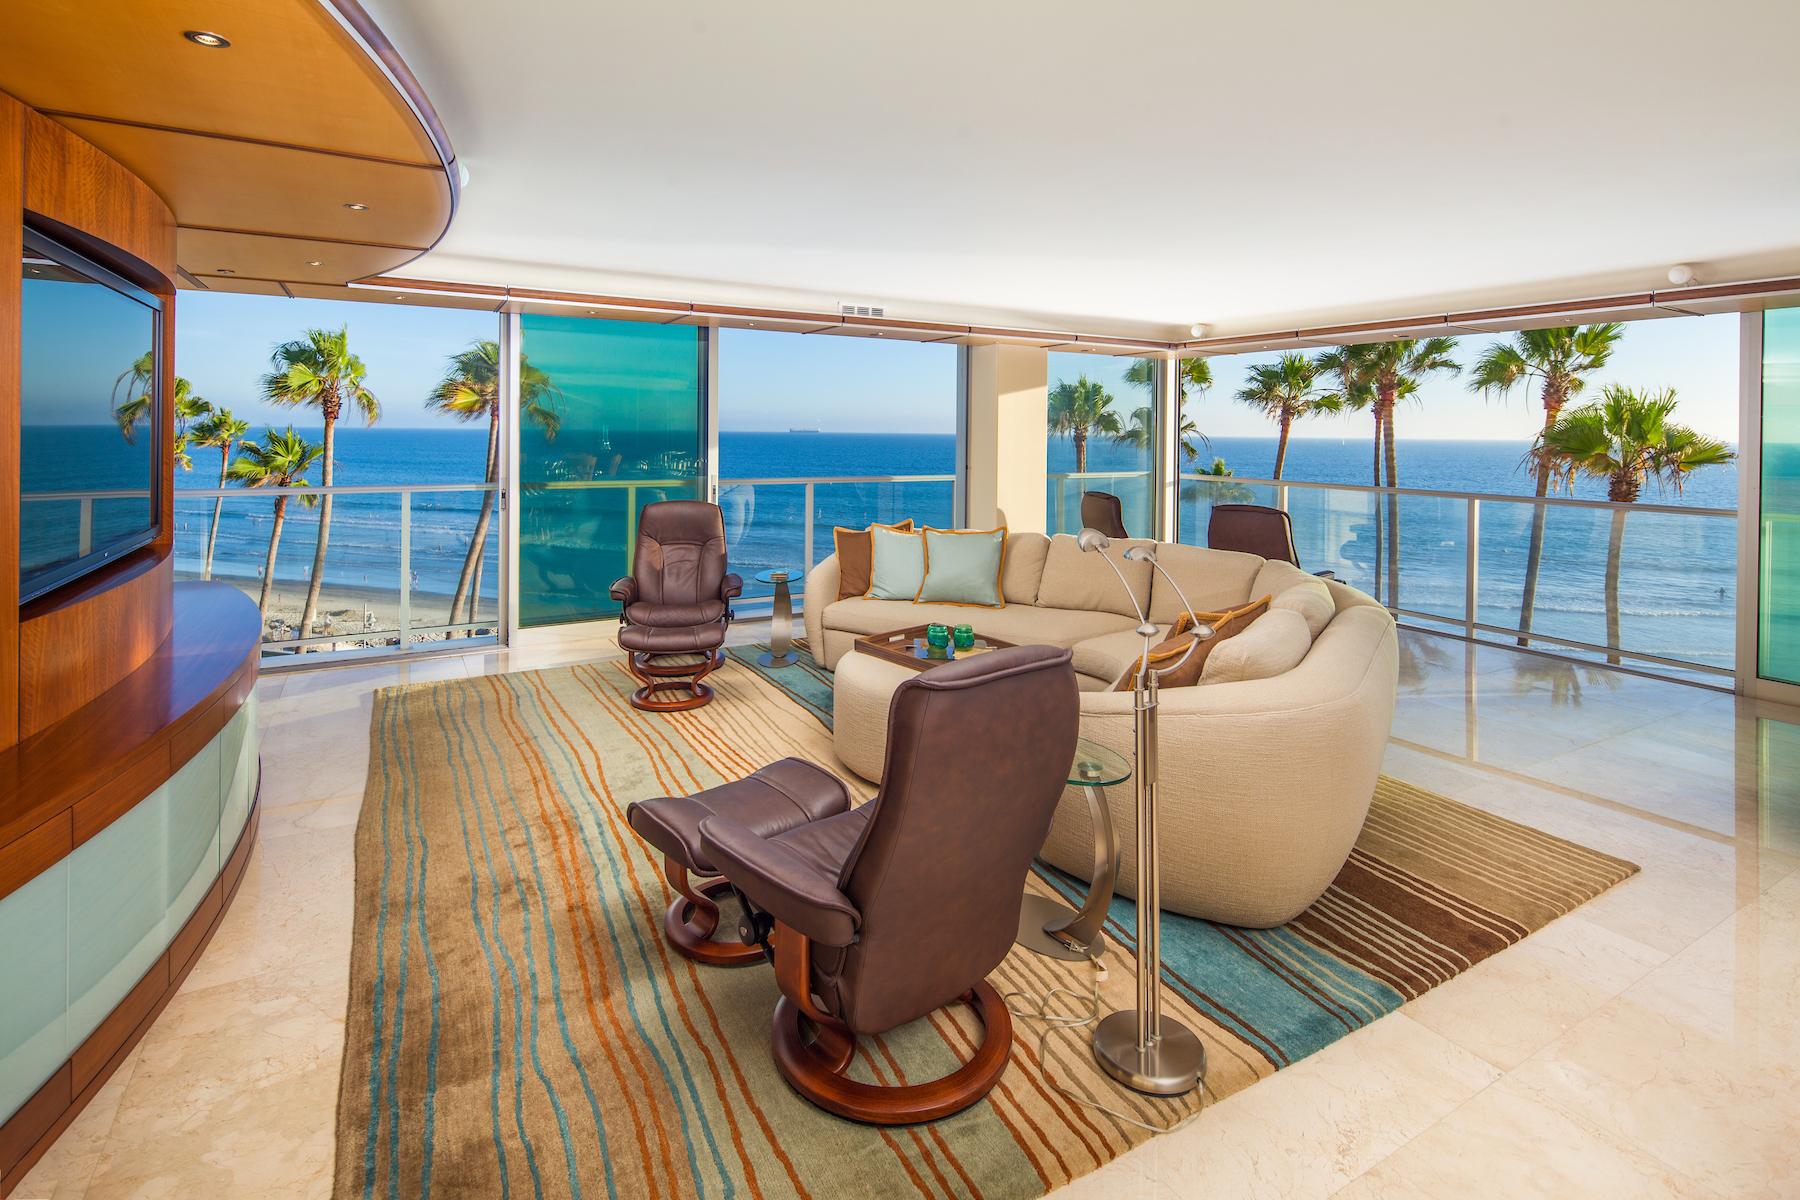 Condominium for Sale at 1780 Avenida Del Mundo #407 Coronado, California 92118 United States